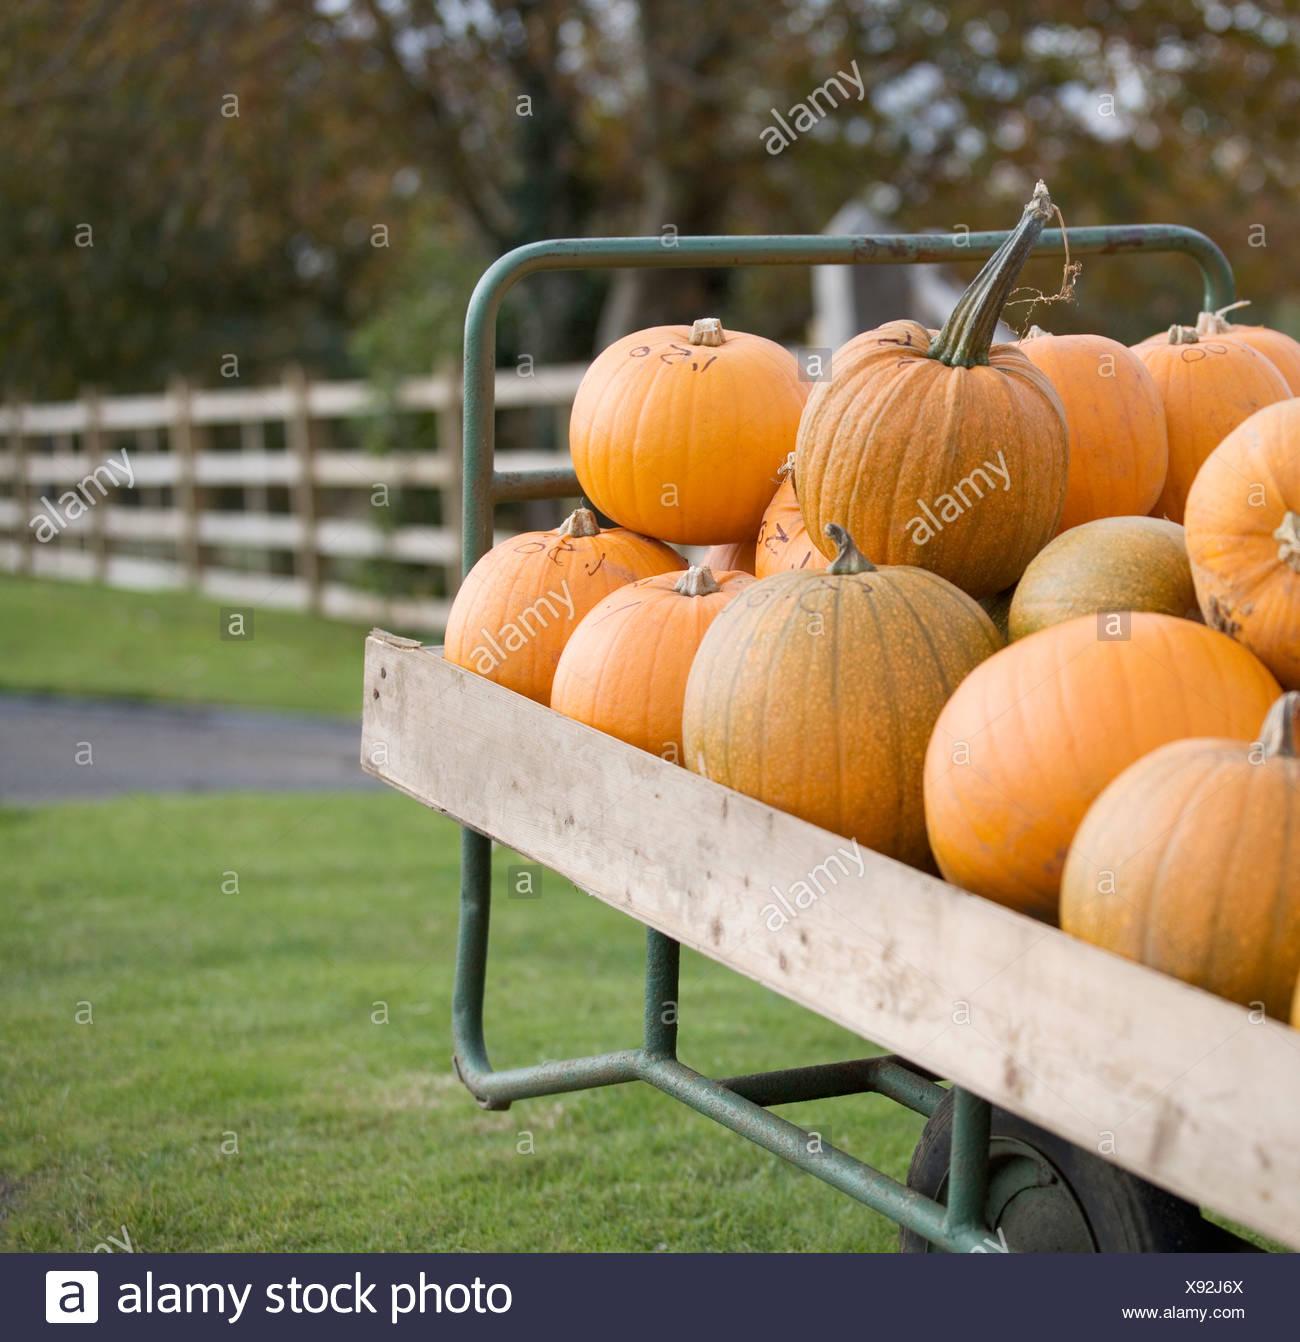 Pumpkins piled on a cart - Stock Image